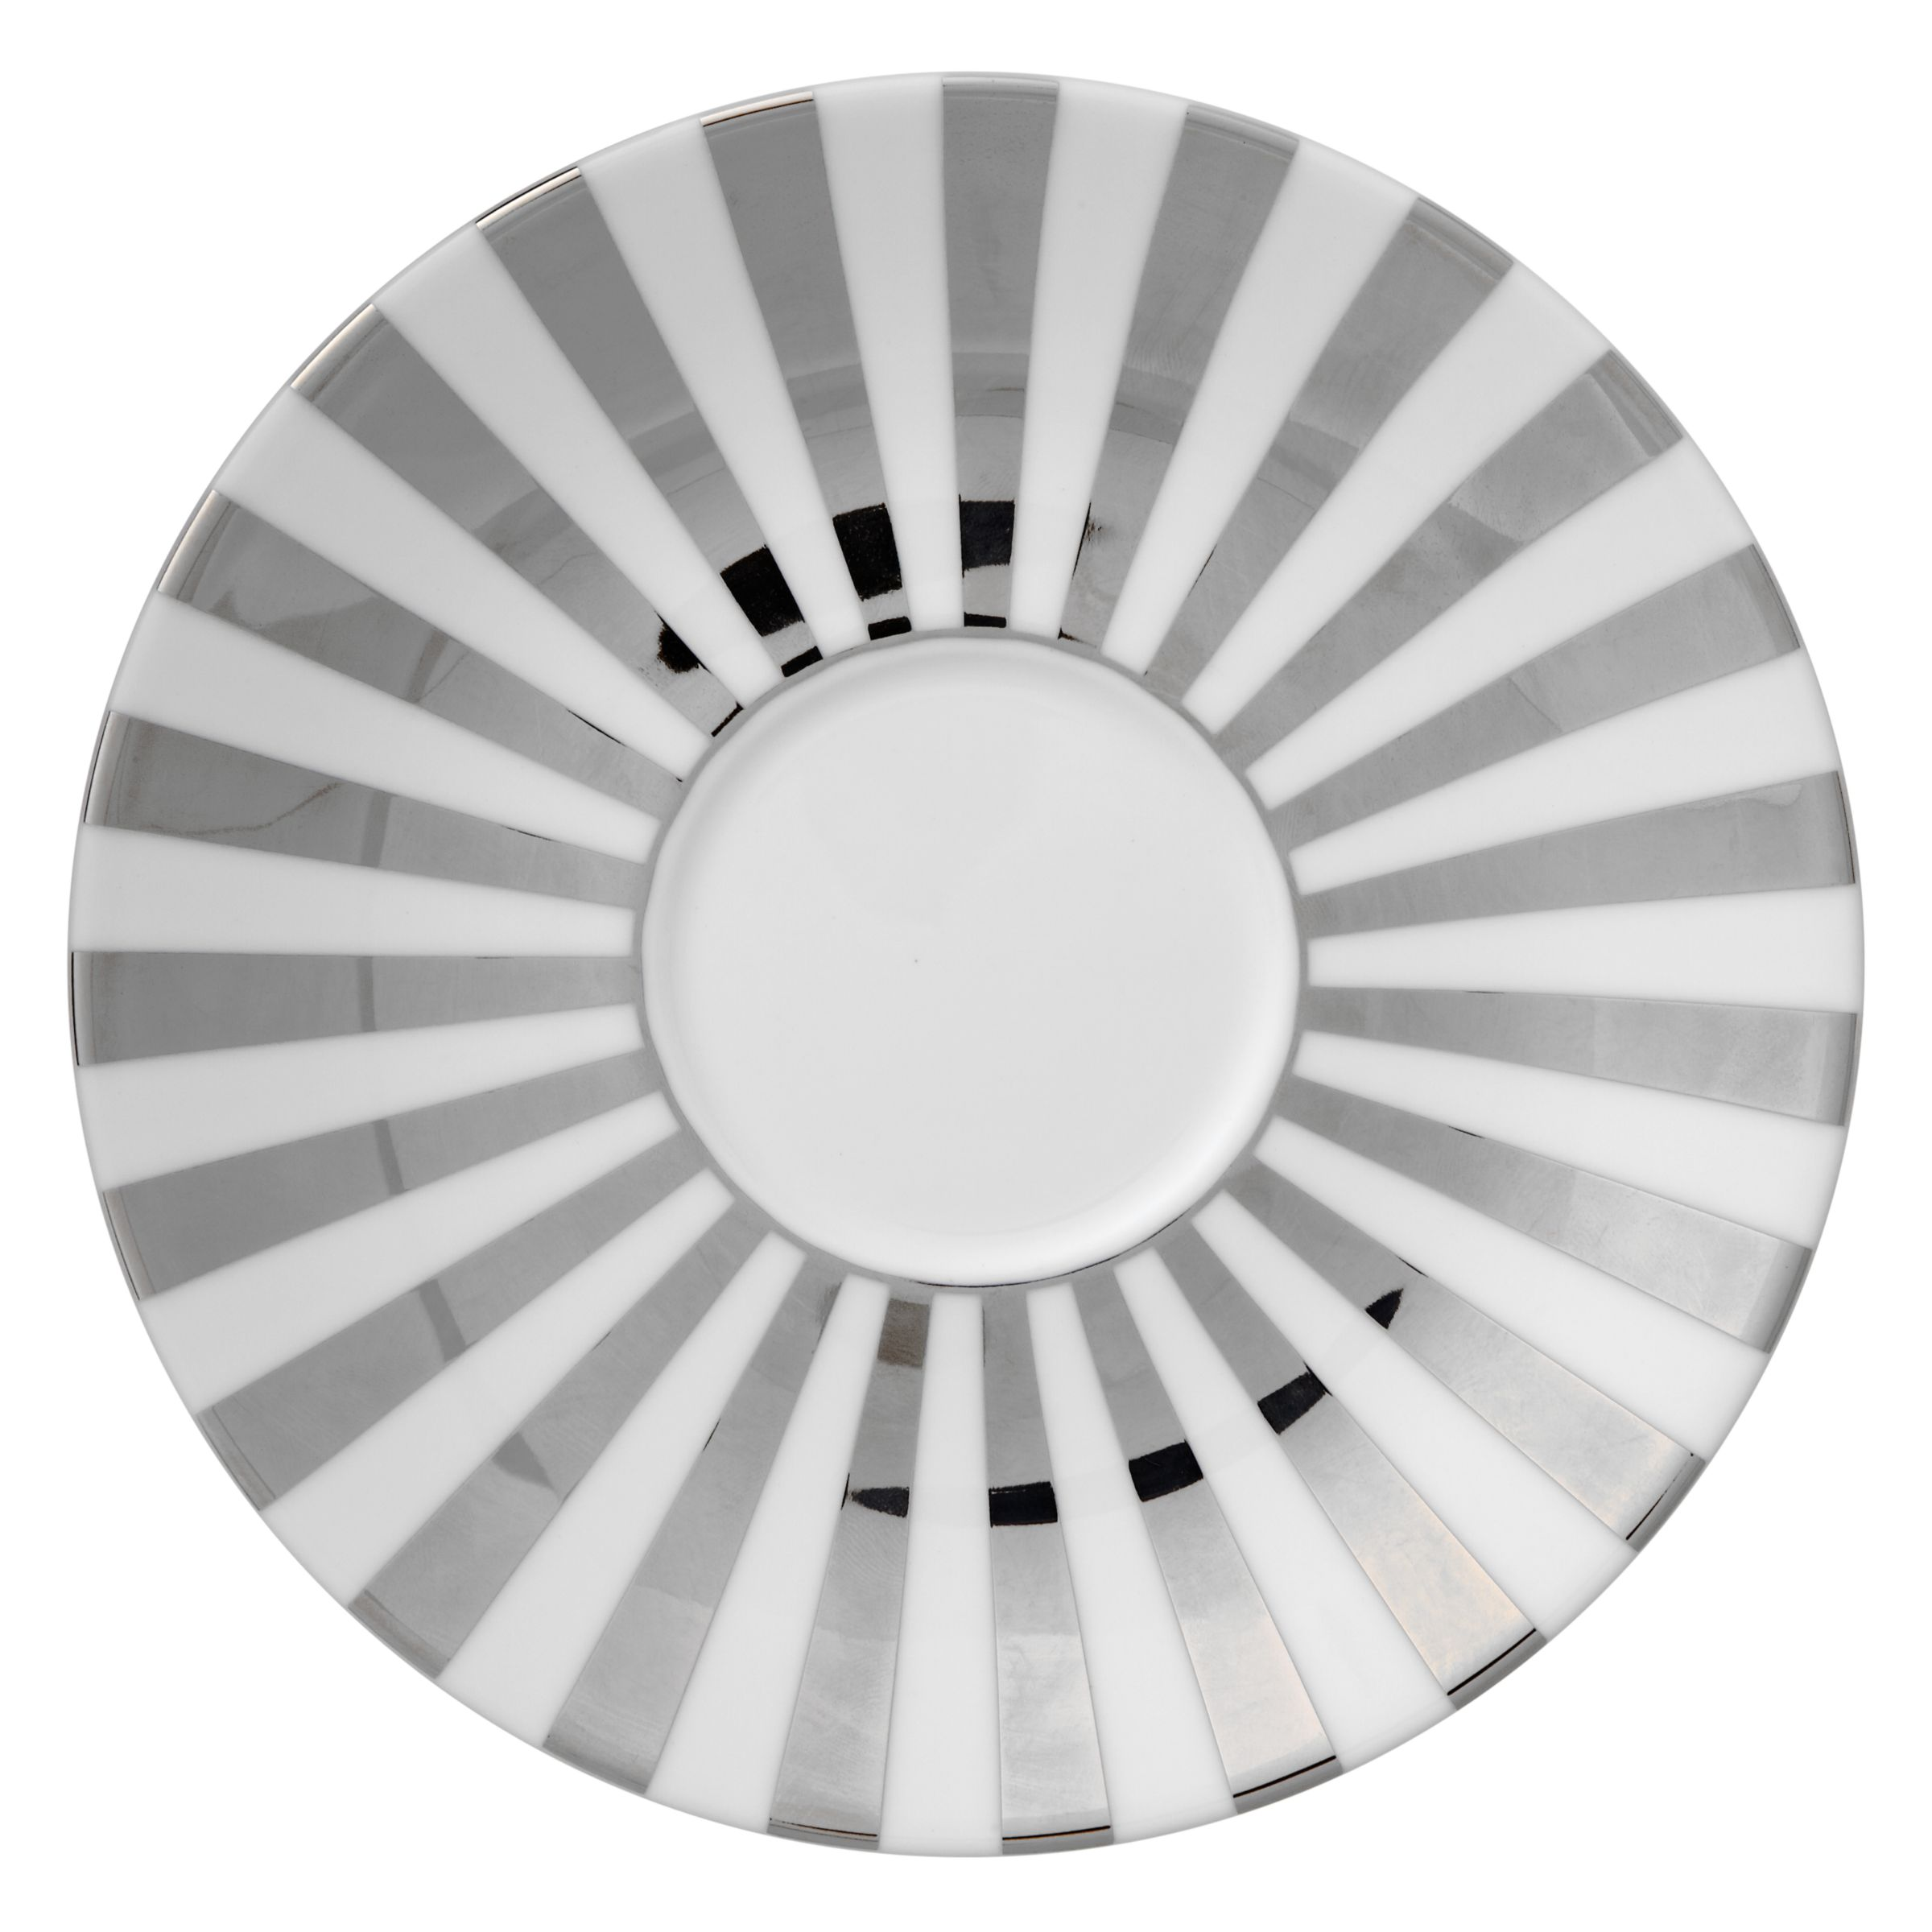 Jasper Conran Jasper Conran for Wedgwood Platinum Striped Tea Saucer